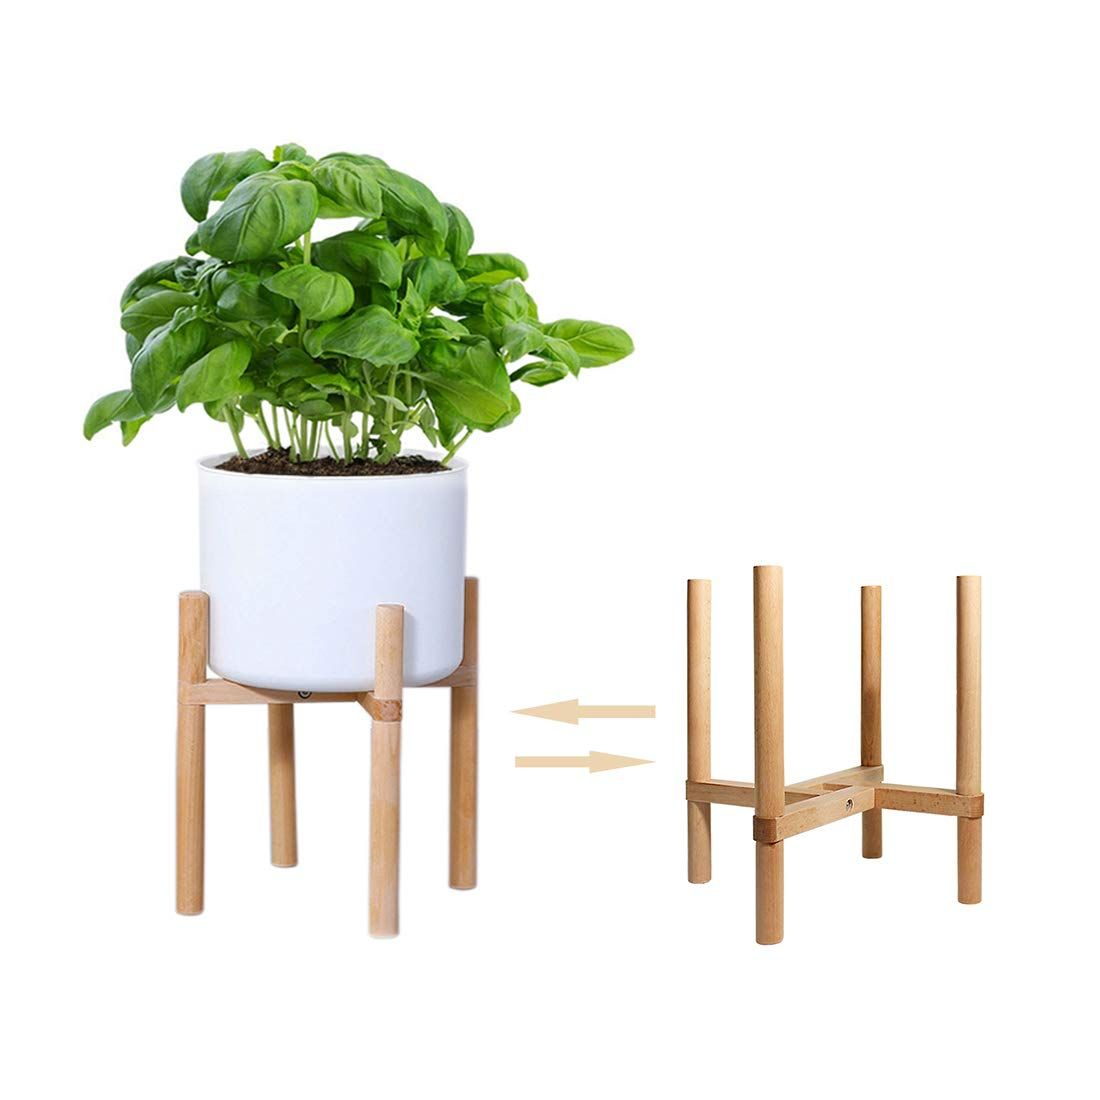 Wood Flower Pot Potted Rack Holder Modern Home Display Plant Stand for Indoors